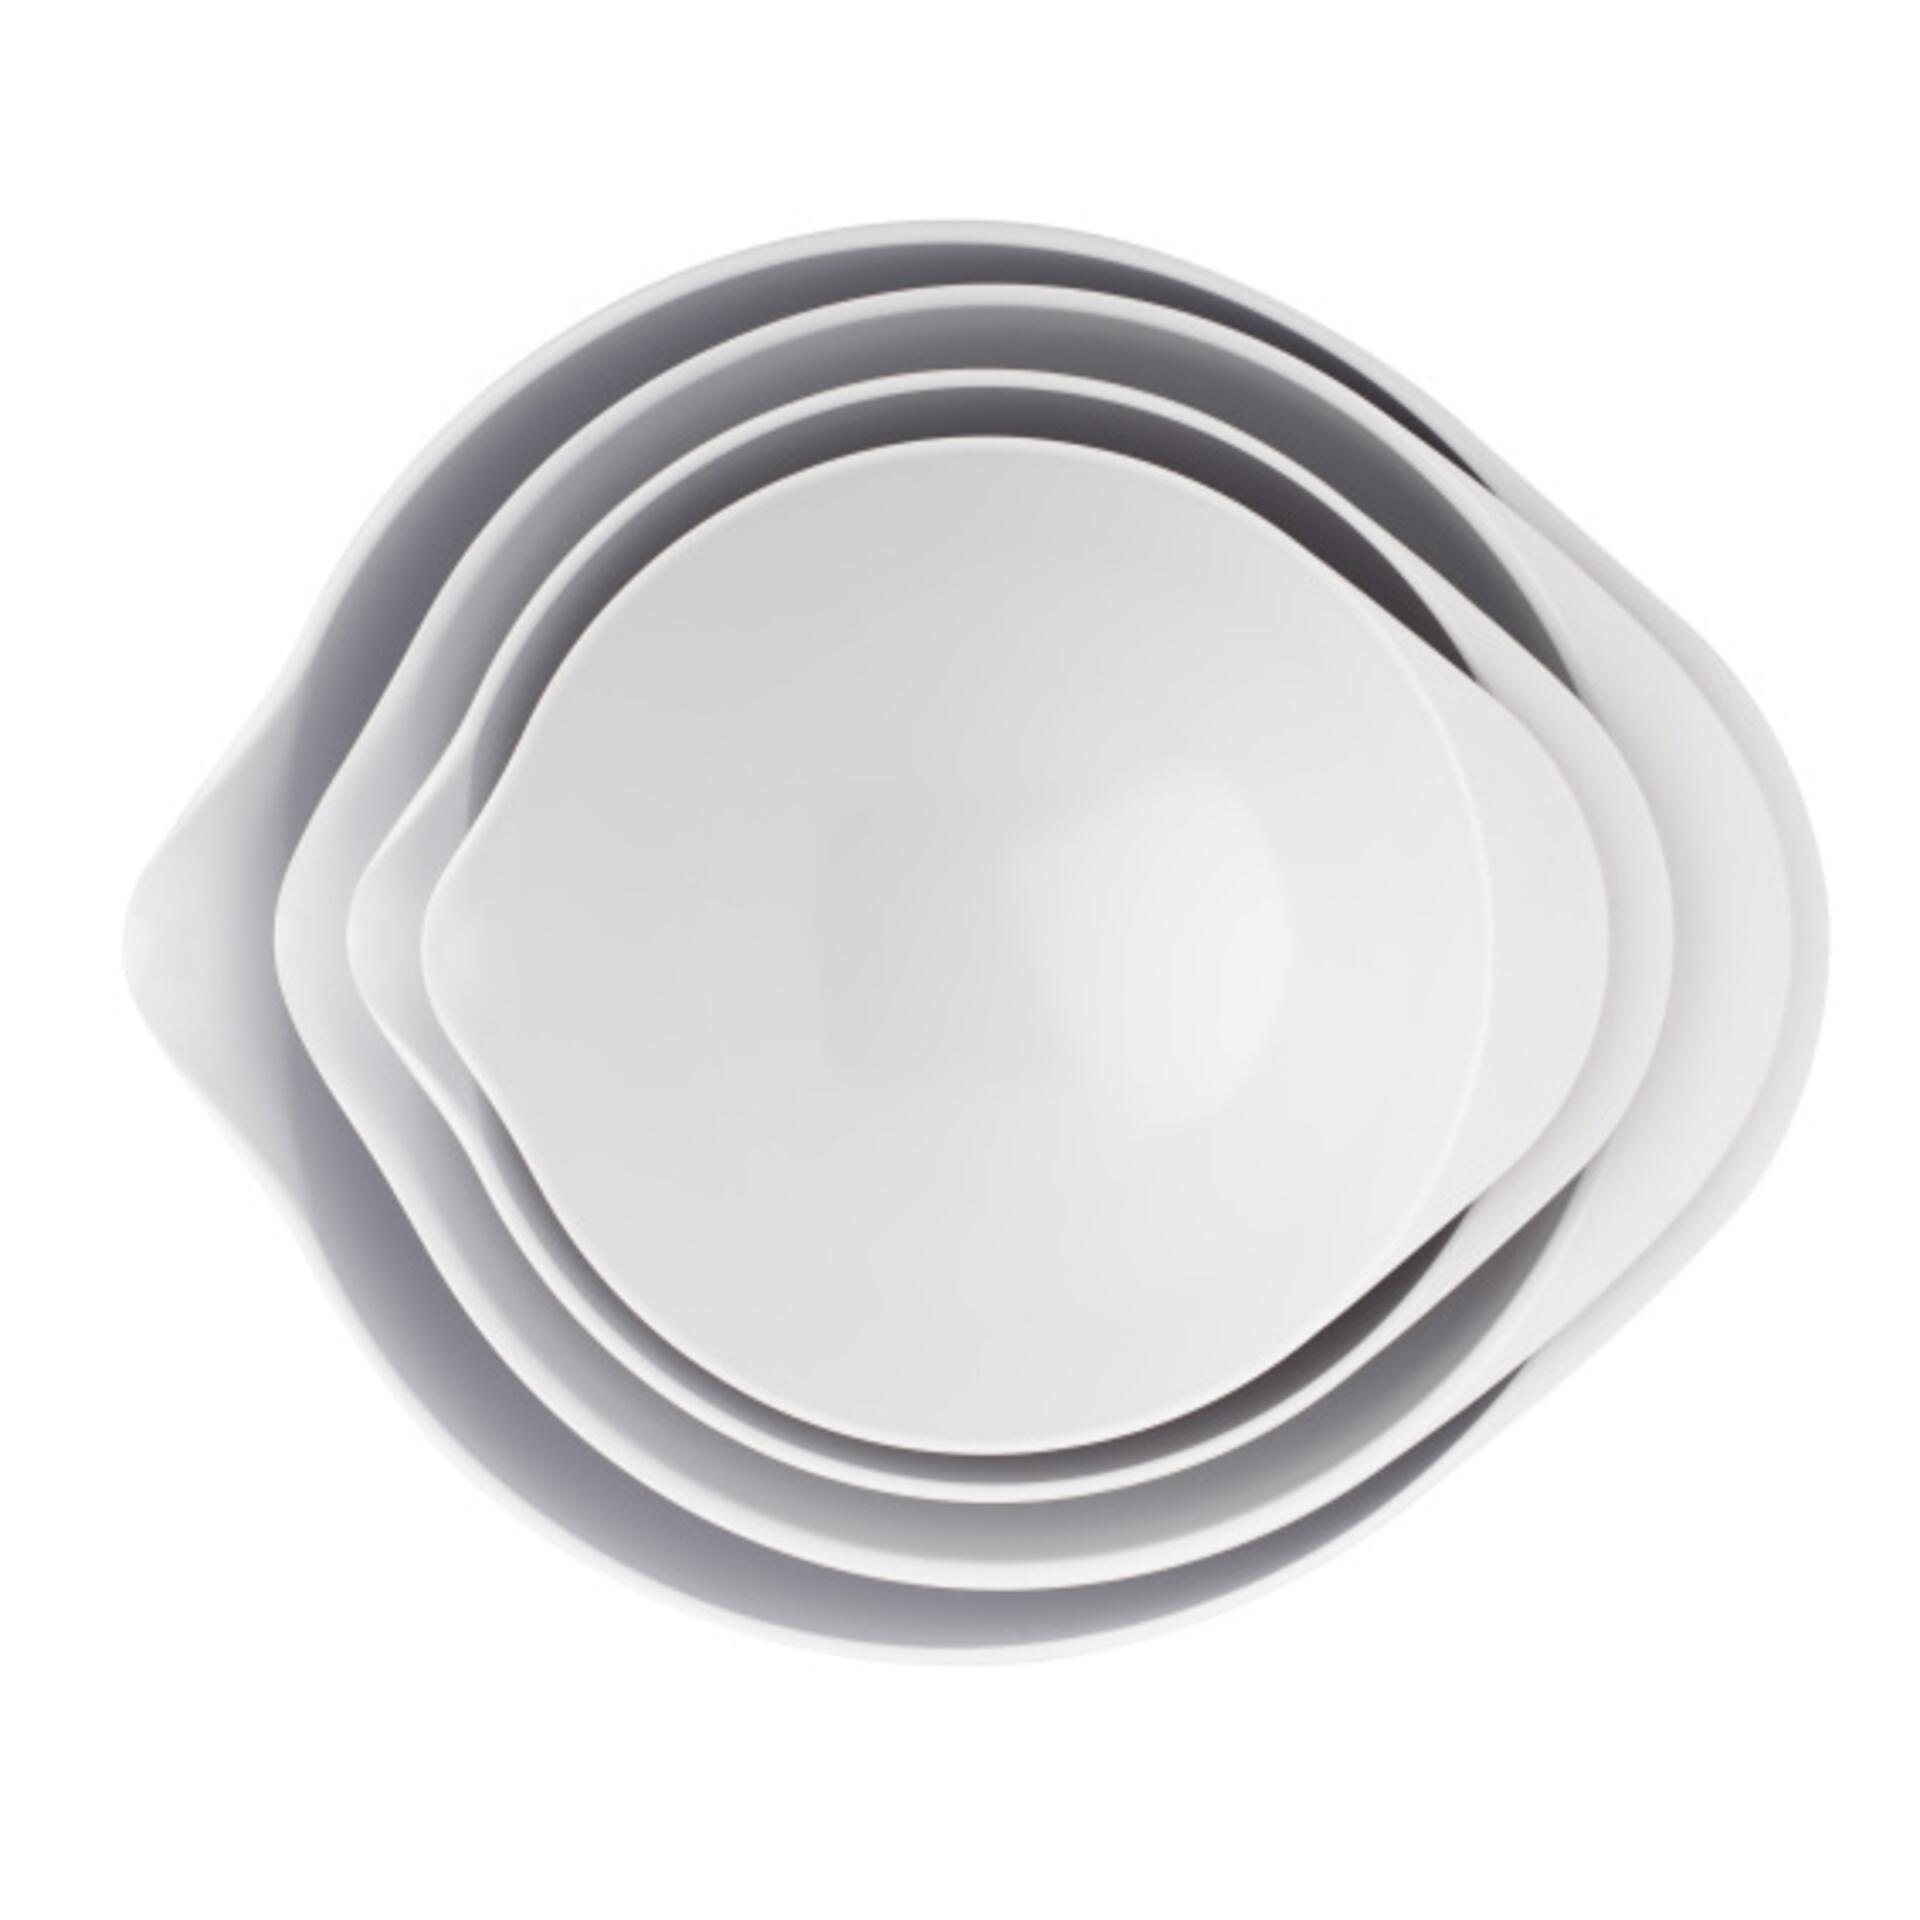 Rosti Mepal Margrethe Rührschüssel 4,0 l Grau